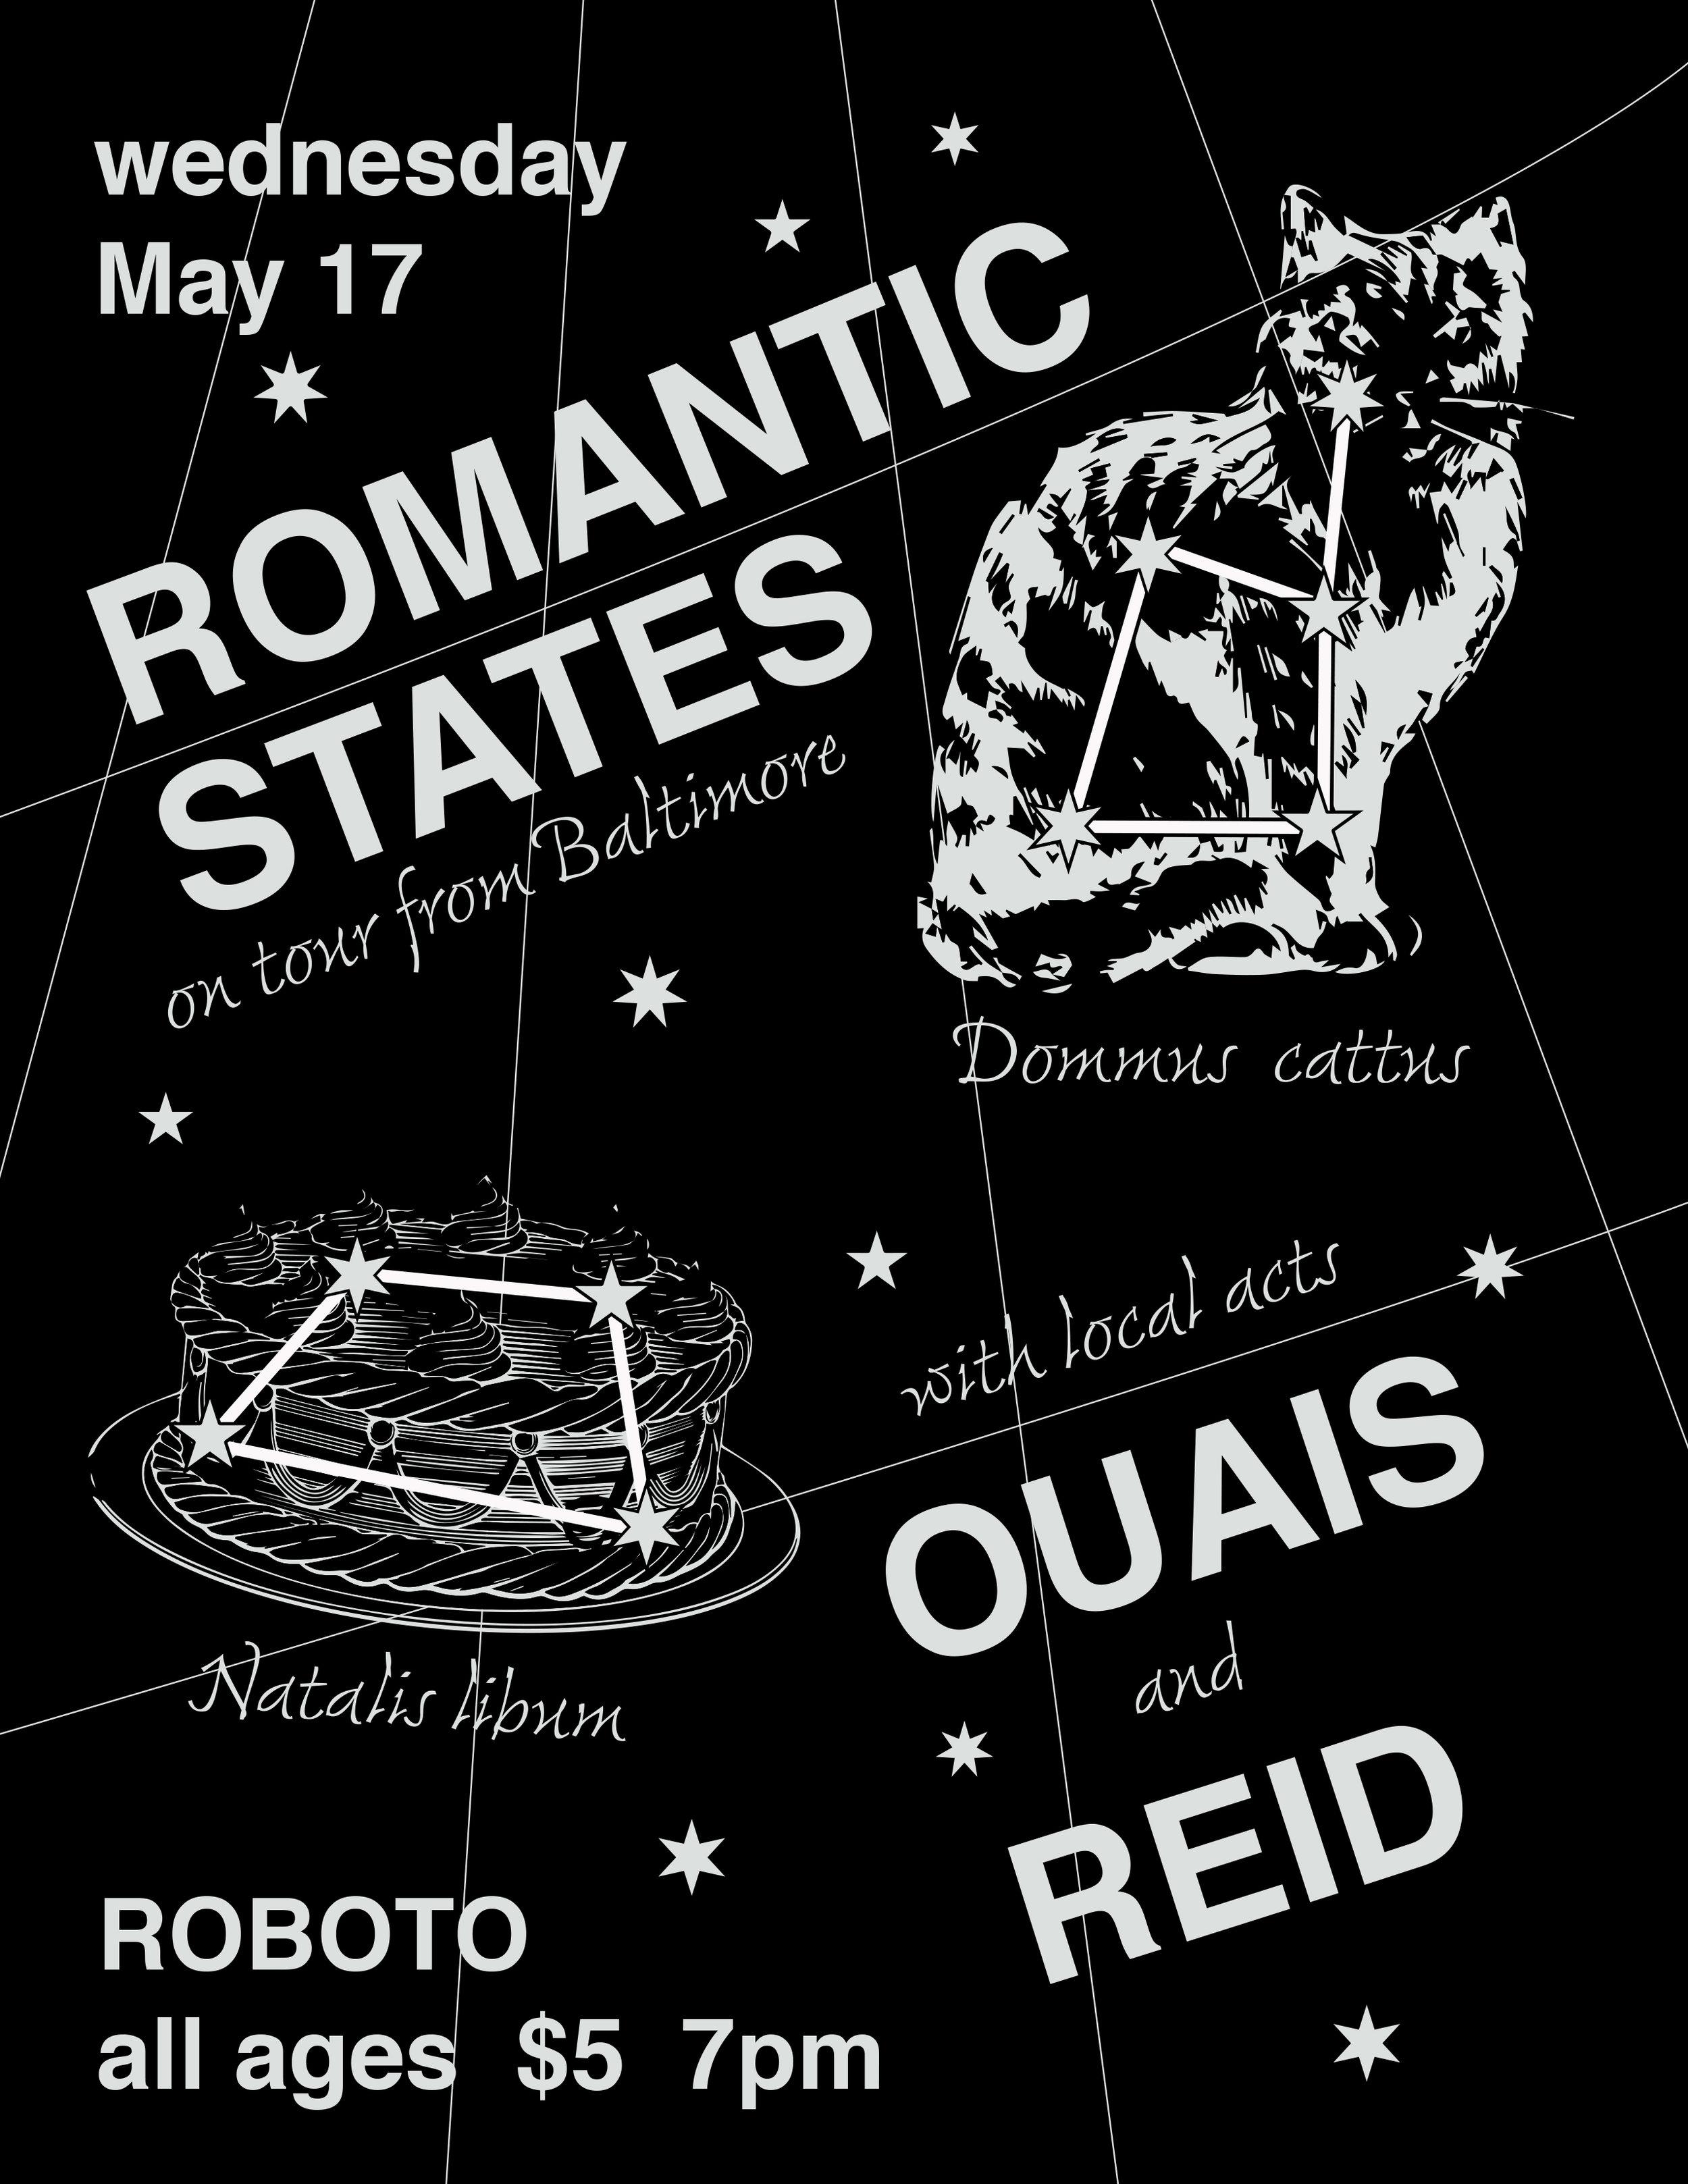 2017.4.28 - romatnic statesFINAL copy.jpg